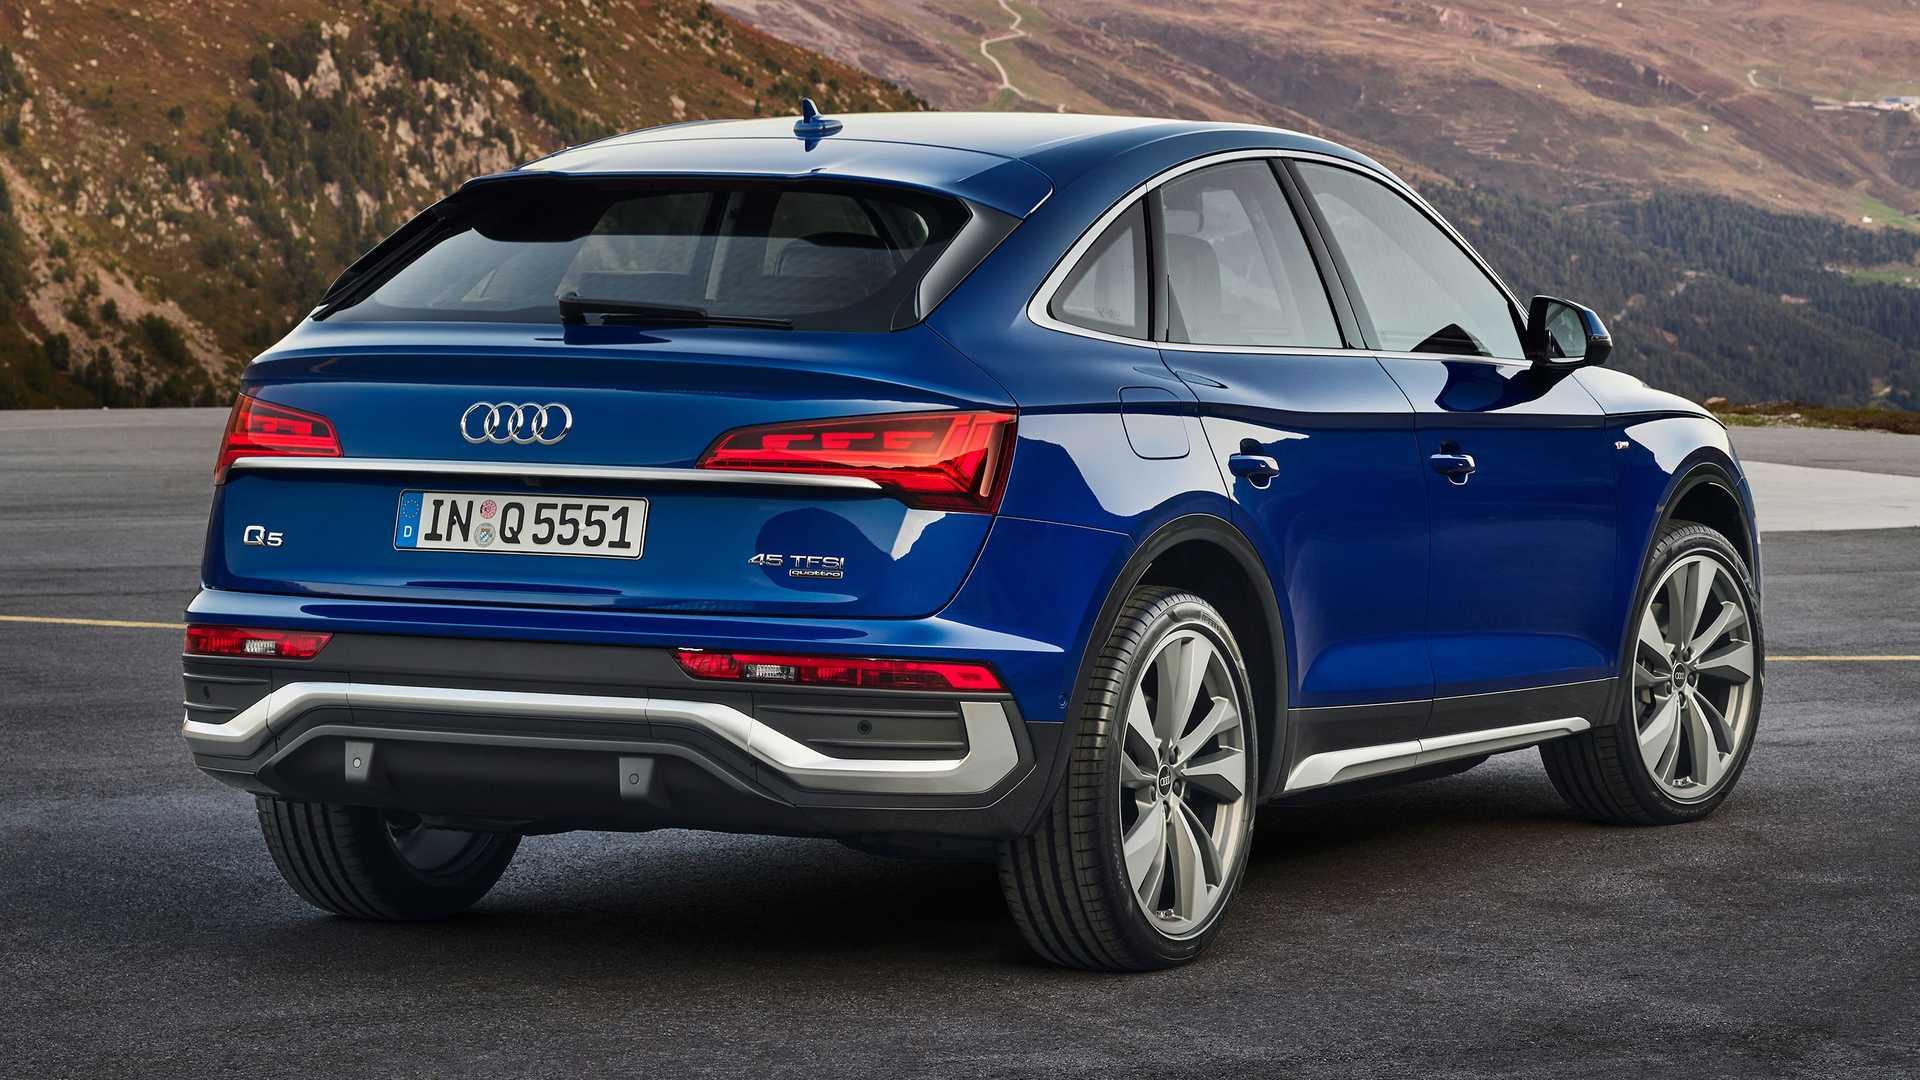 La nuova Audi Q5 Sportback è stata svelata: foto e novità